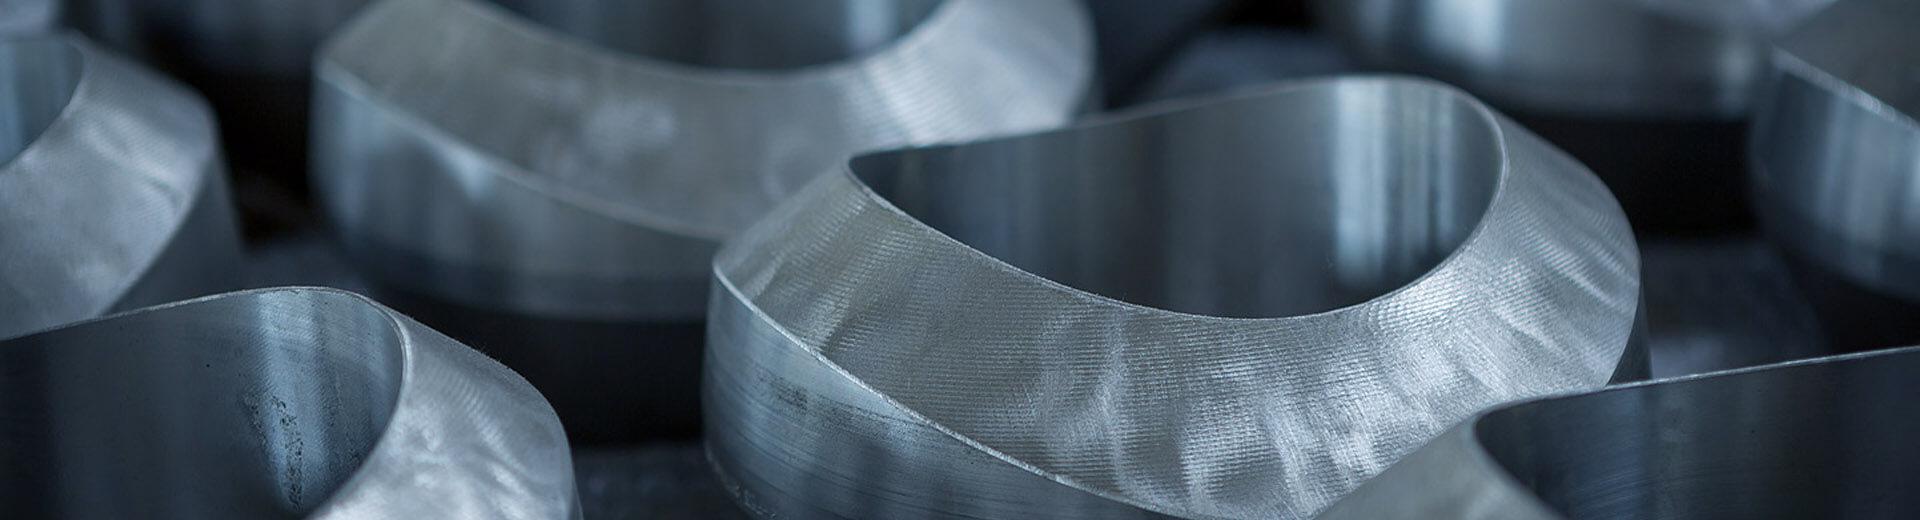 Steeltrade-raccordi-industriali3